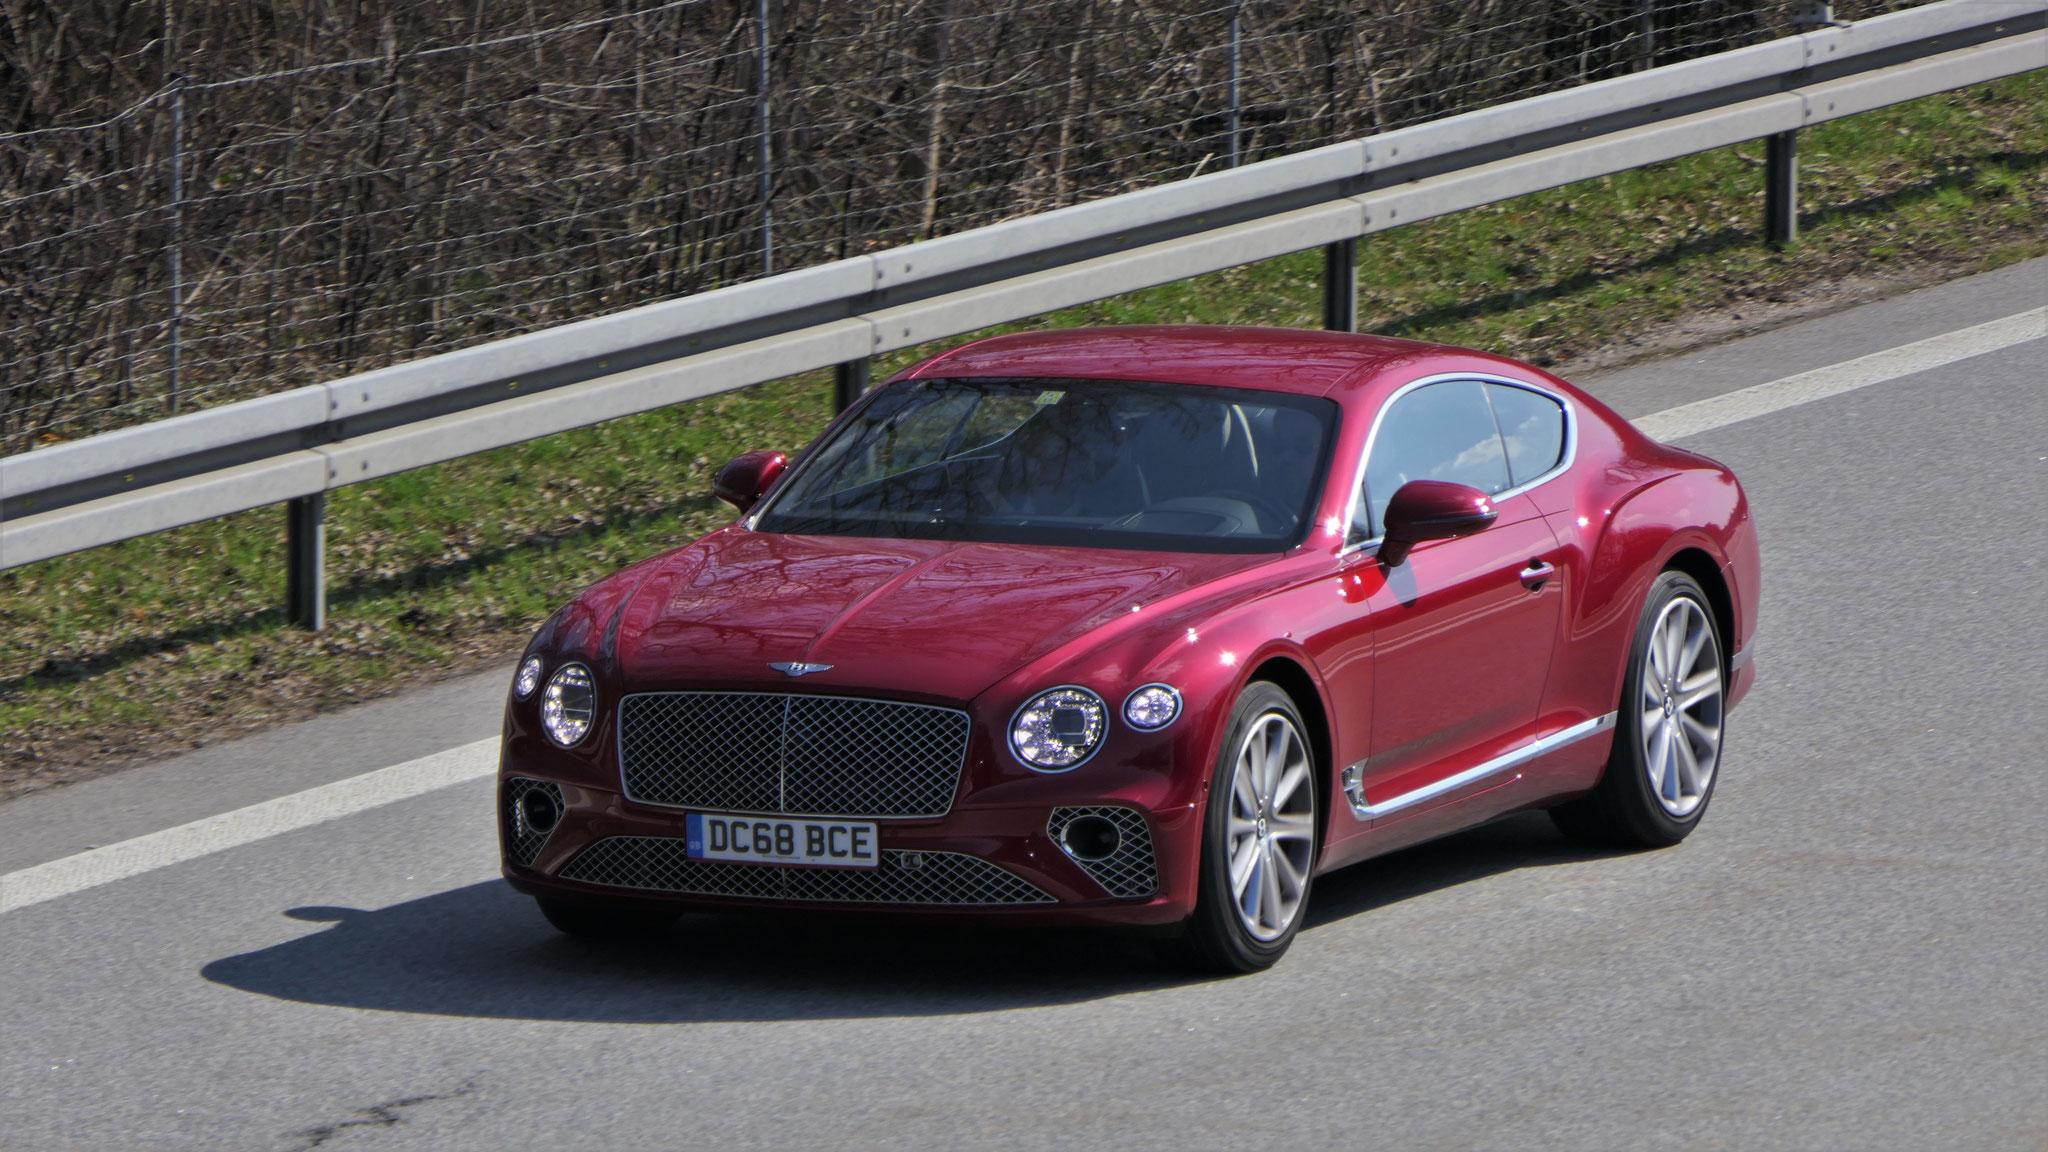 Bentley Continental GT - DC68-BCE (GB)